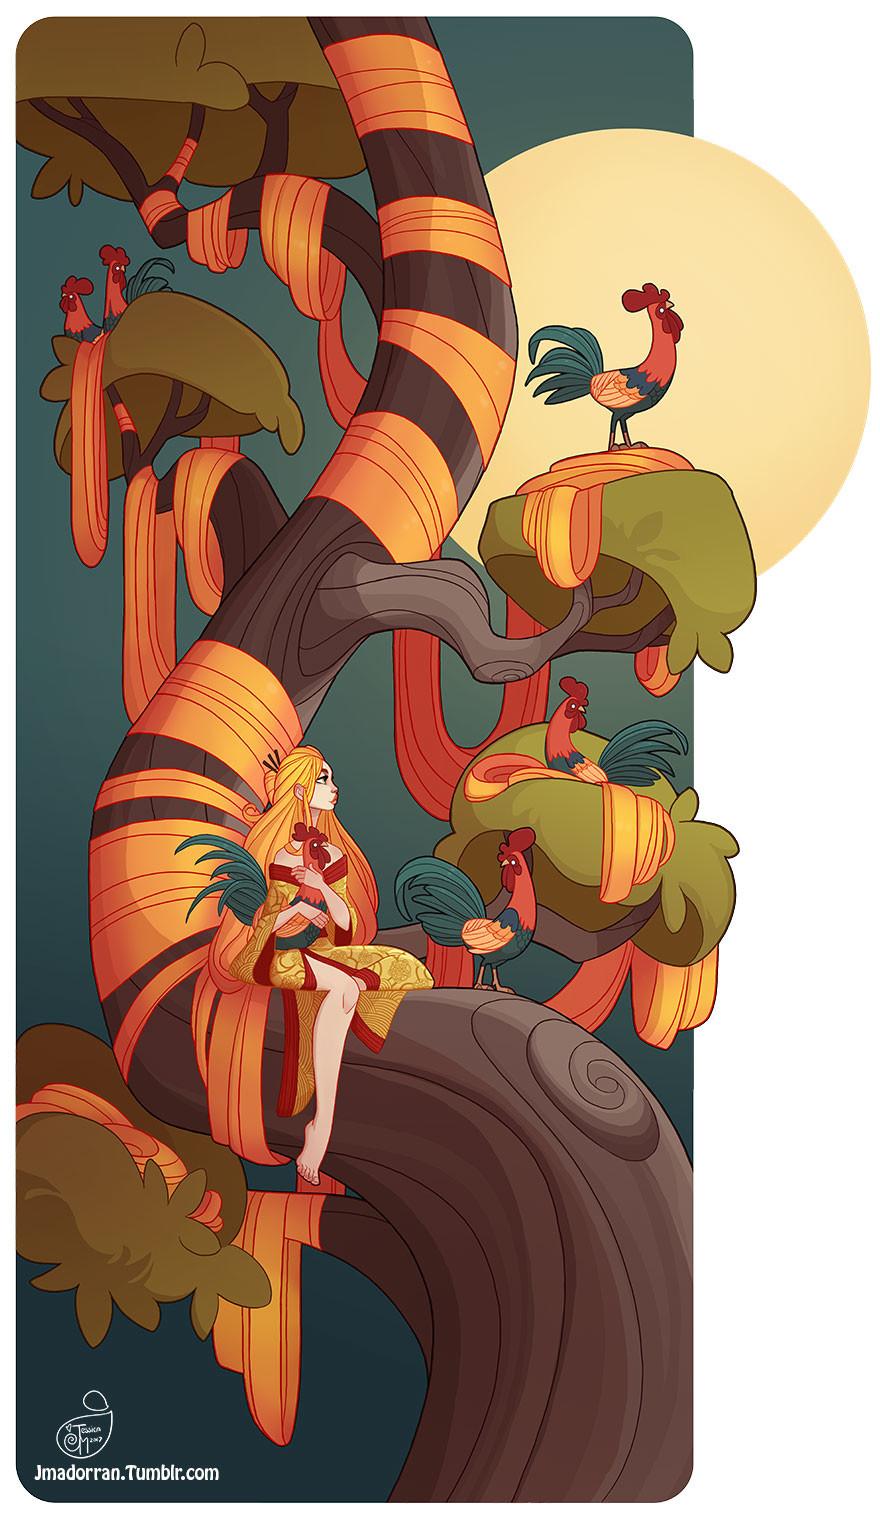 Jessica madorran character design chinesenewyear firerooster2017 artstation